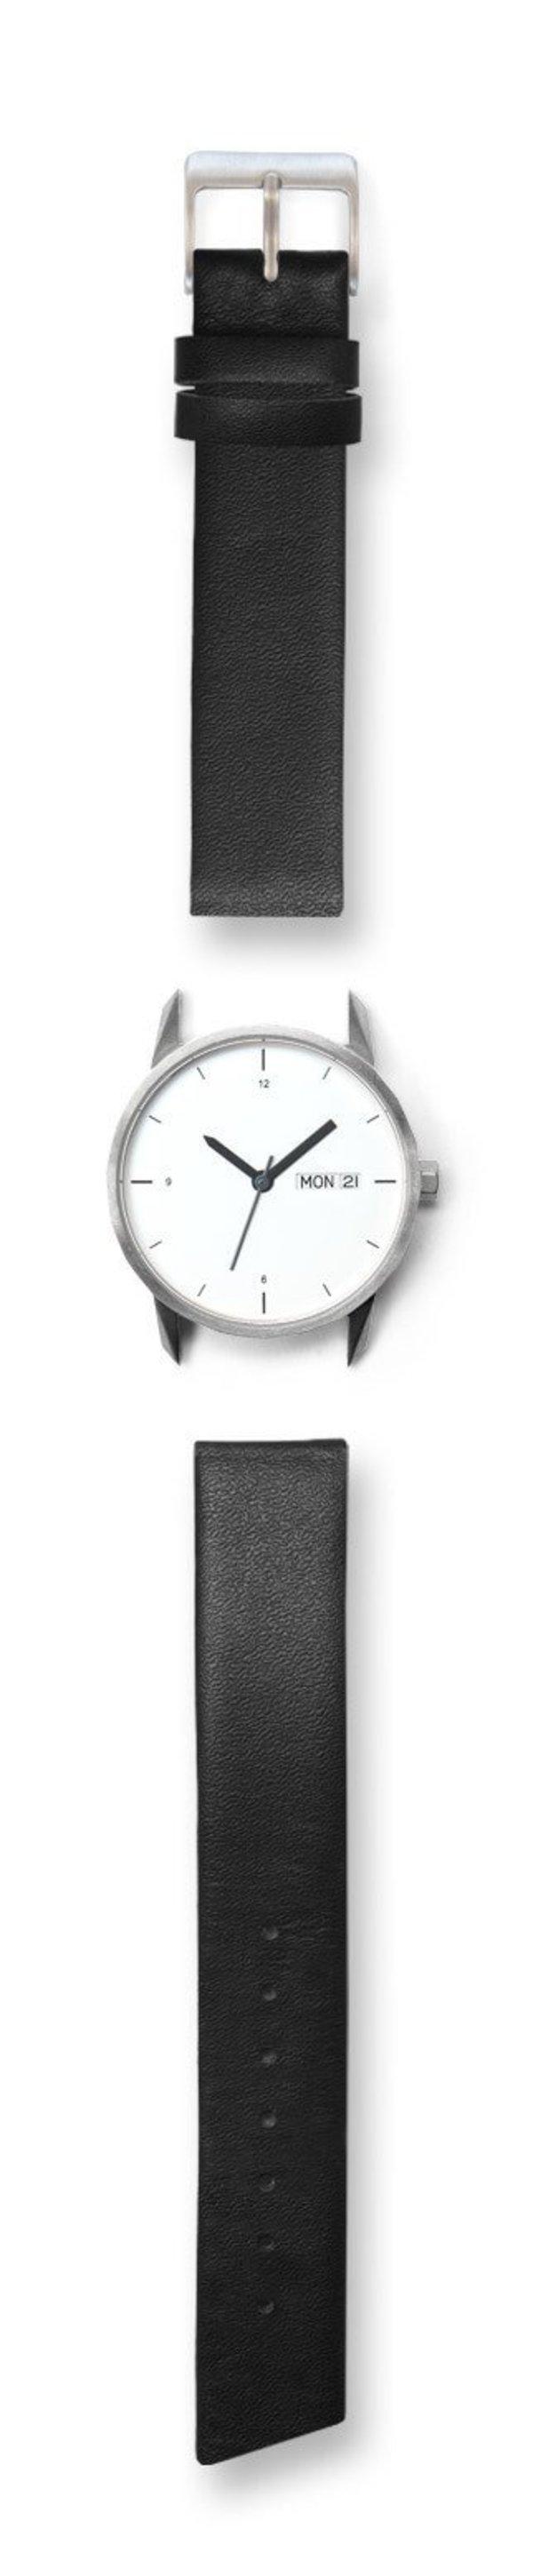 Unisex Tinker Watches 34mm Silver Watch Black Strap